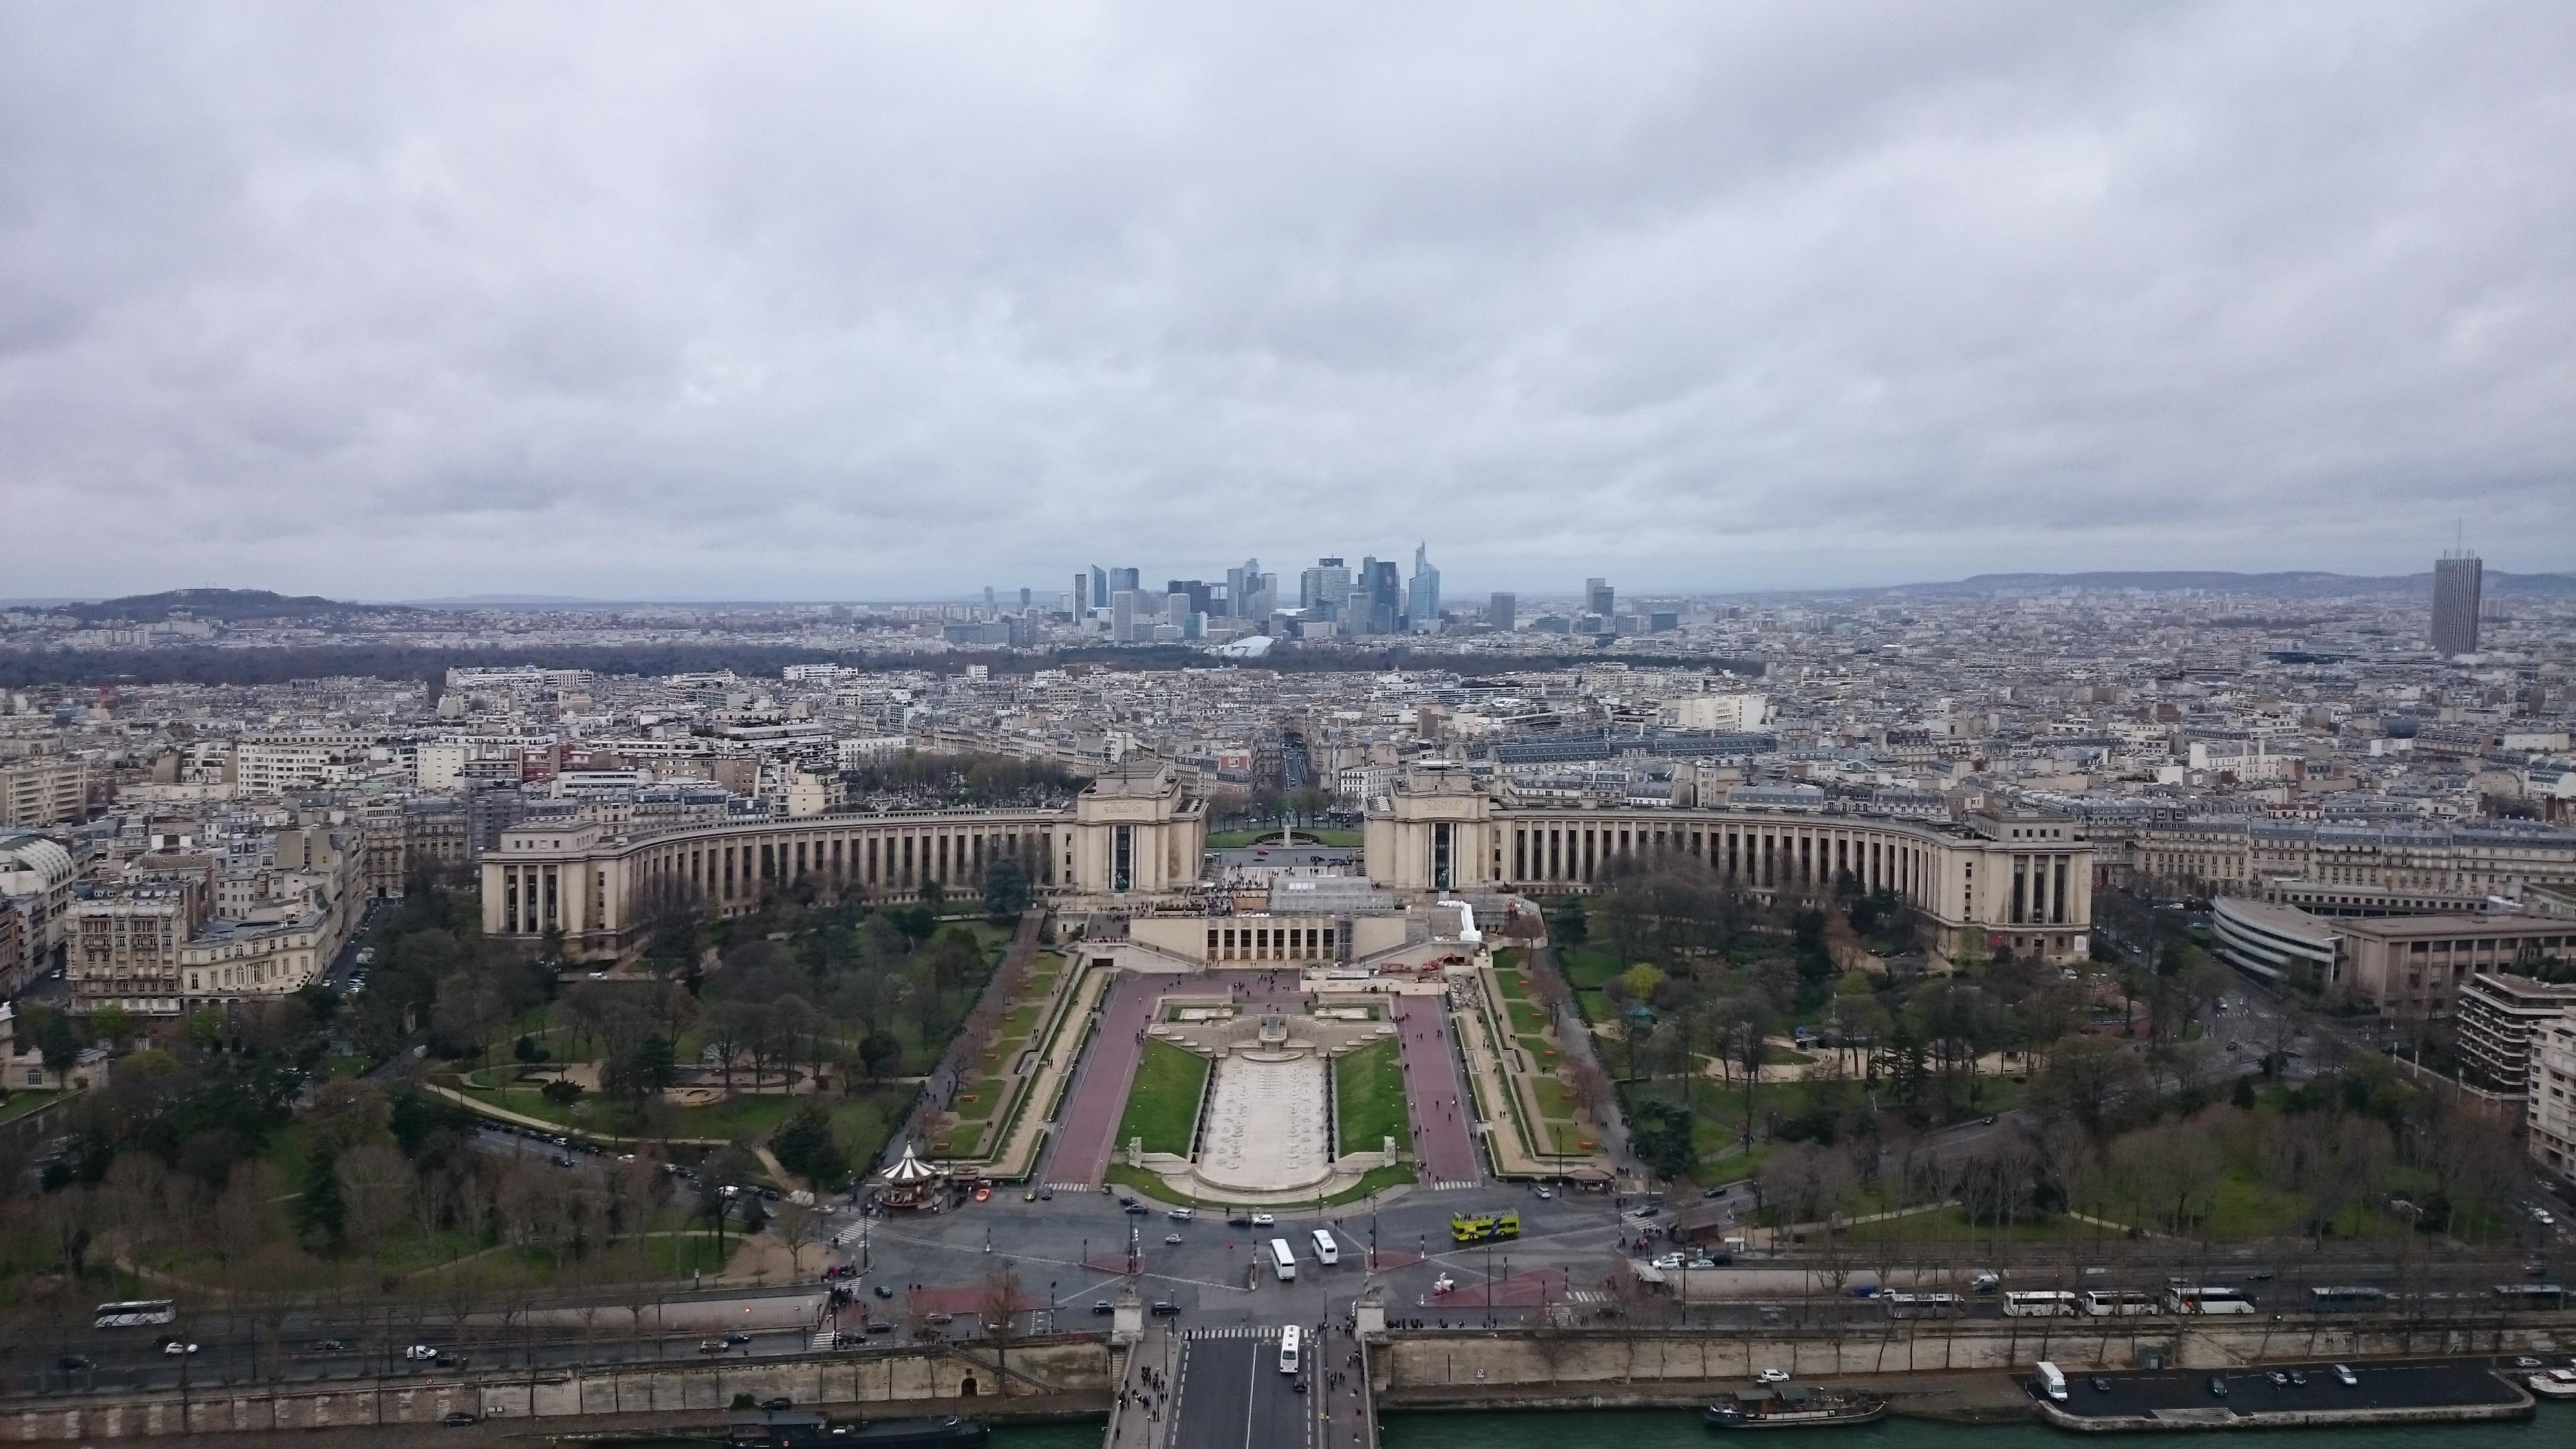 DSC 1944 - Visitando la Torre Eiffel en Paris